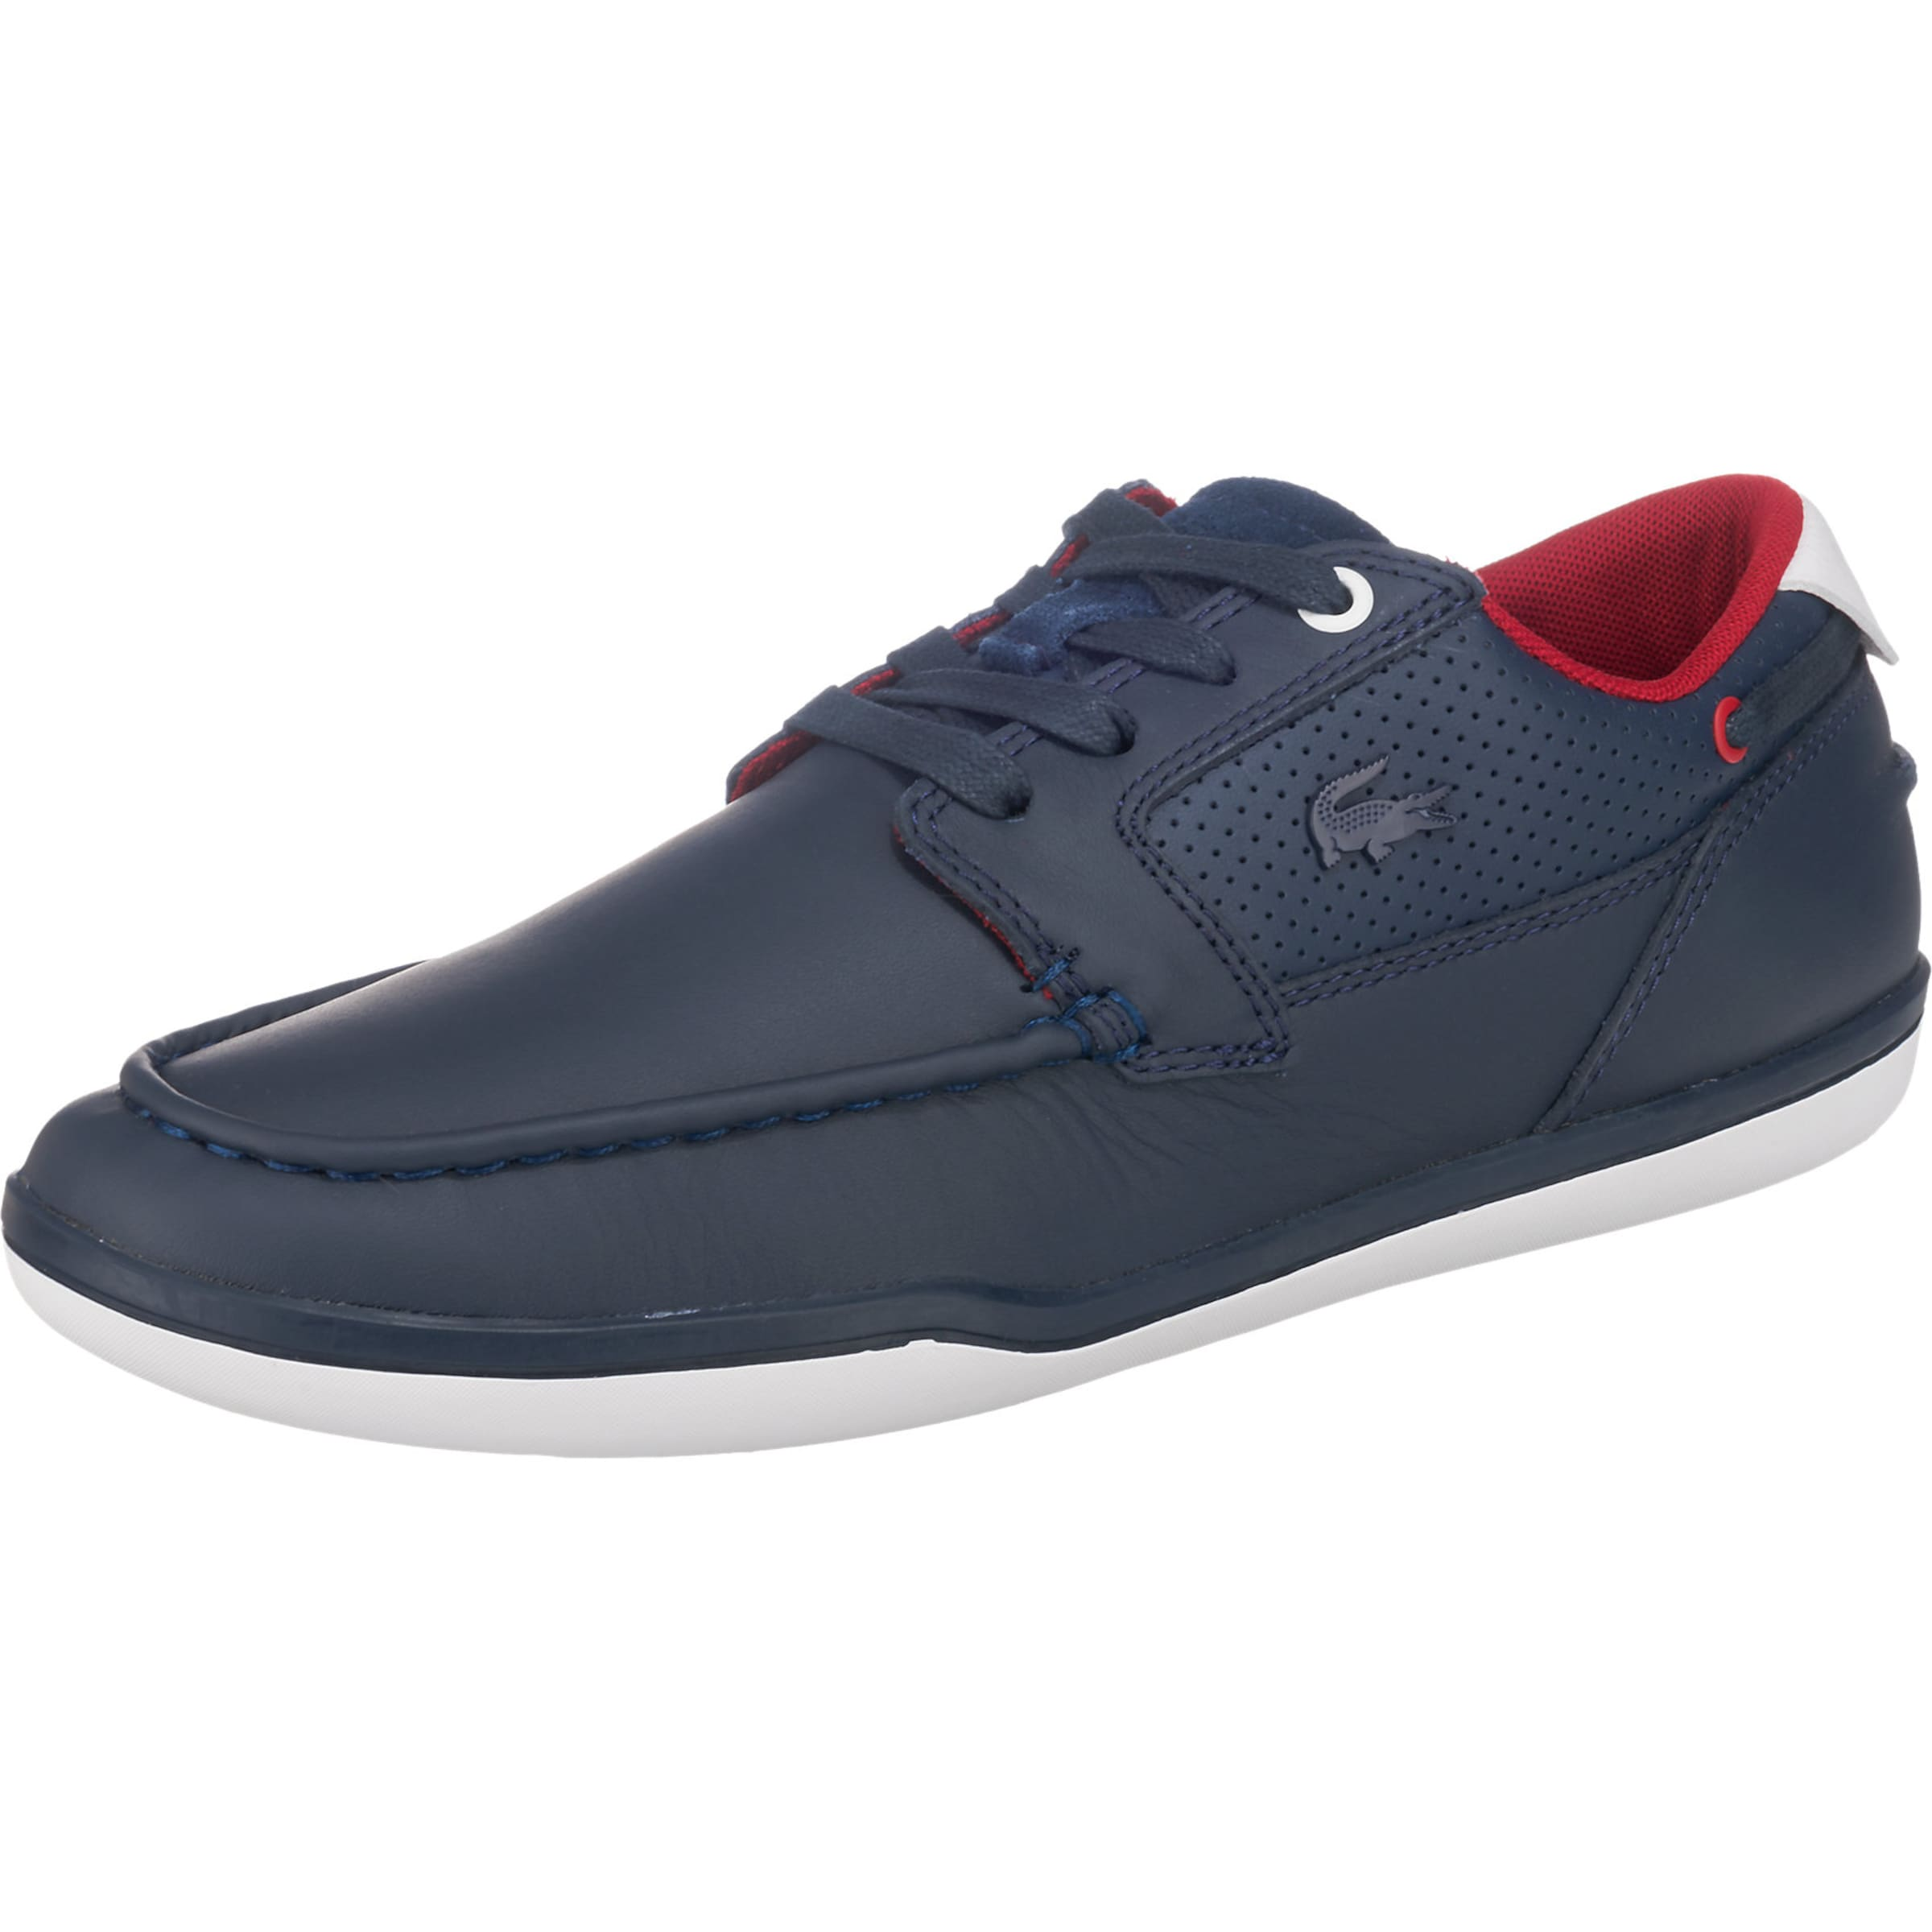 LACOSTE Deck-Minimal Sneakers Günstige und langlebige Schuhe